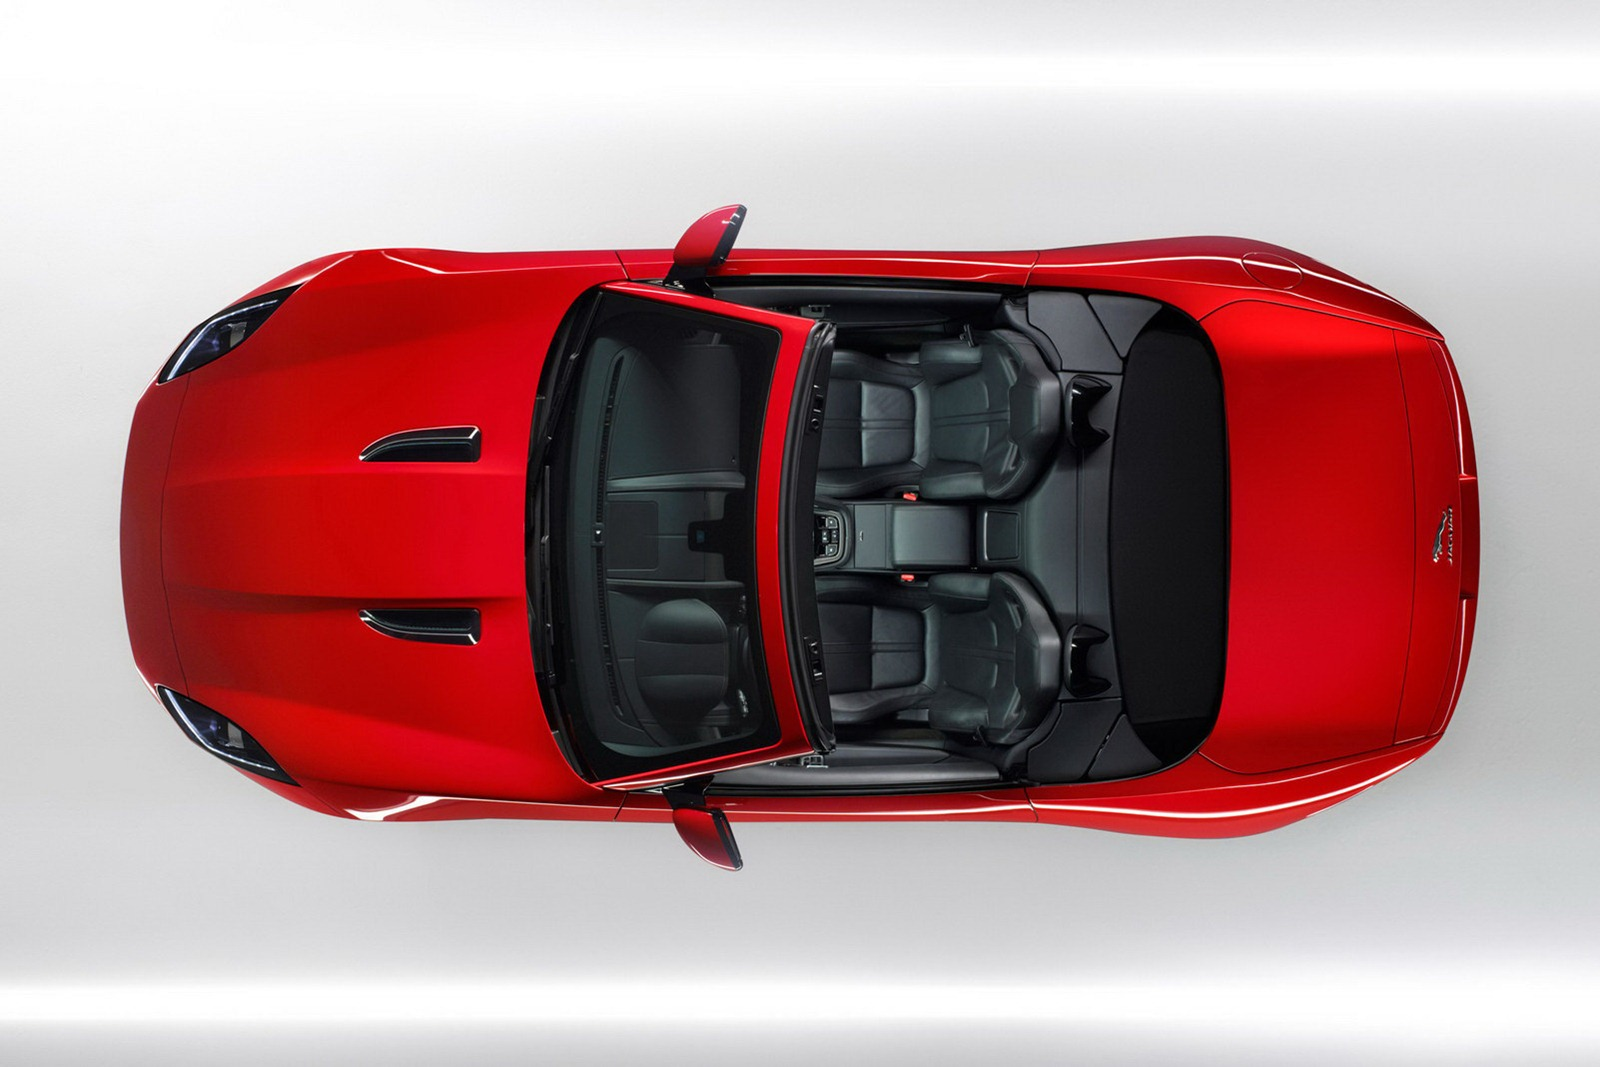 New 2013 Jaguar F Type Roadster Price Starts At 69 000 Autotribute